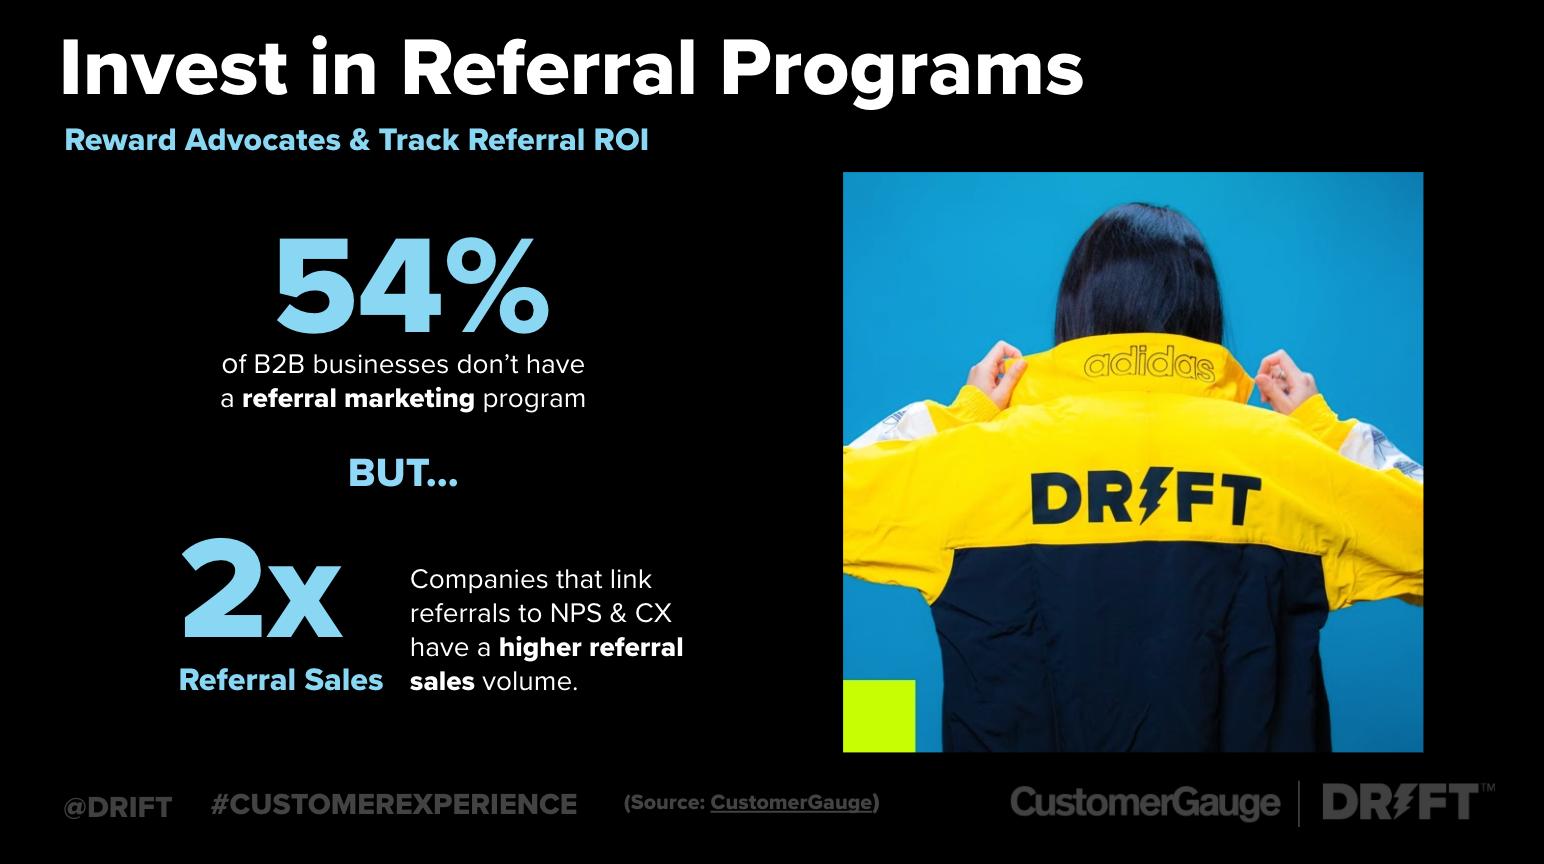 referrals programs for marketing ROI